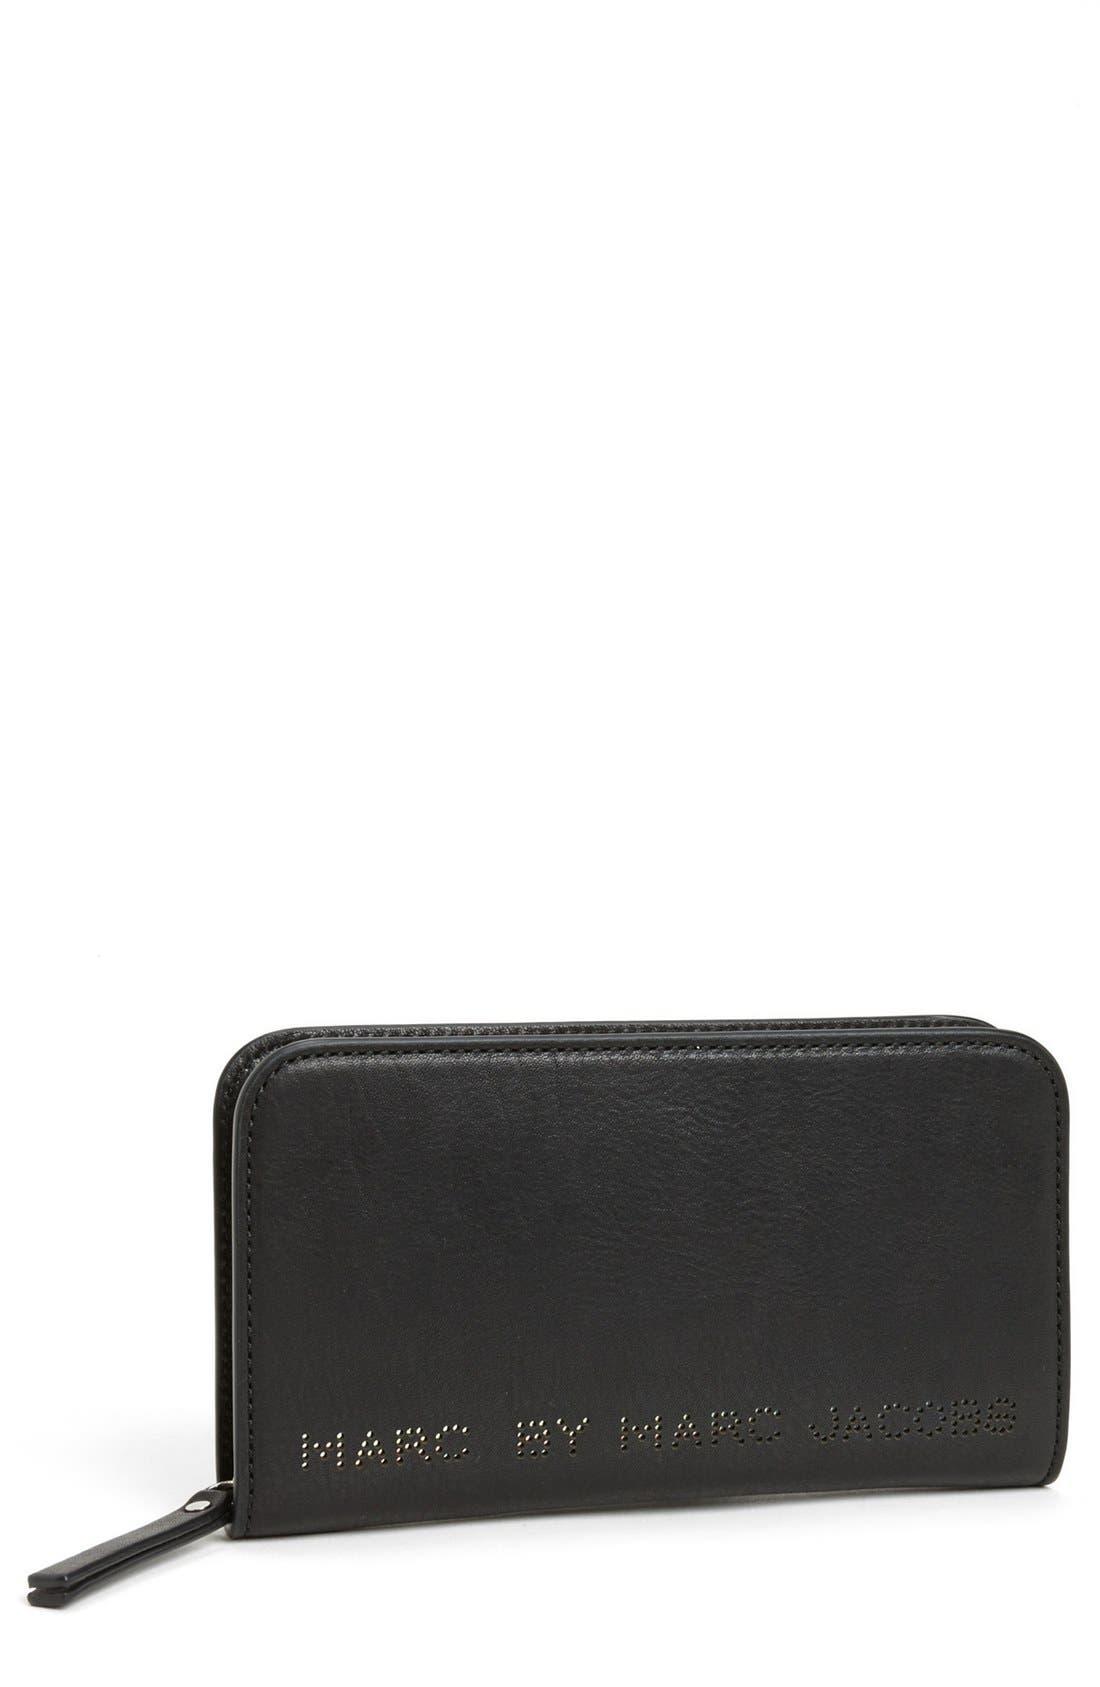 Alternate Image 1 Selected - MARC BY MARC JACOBS 'Sweet Jane - Medium' Leather Zip Wallet